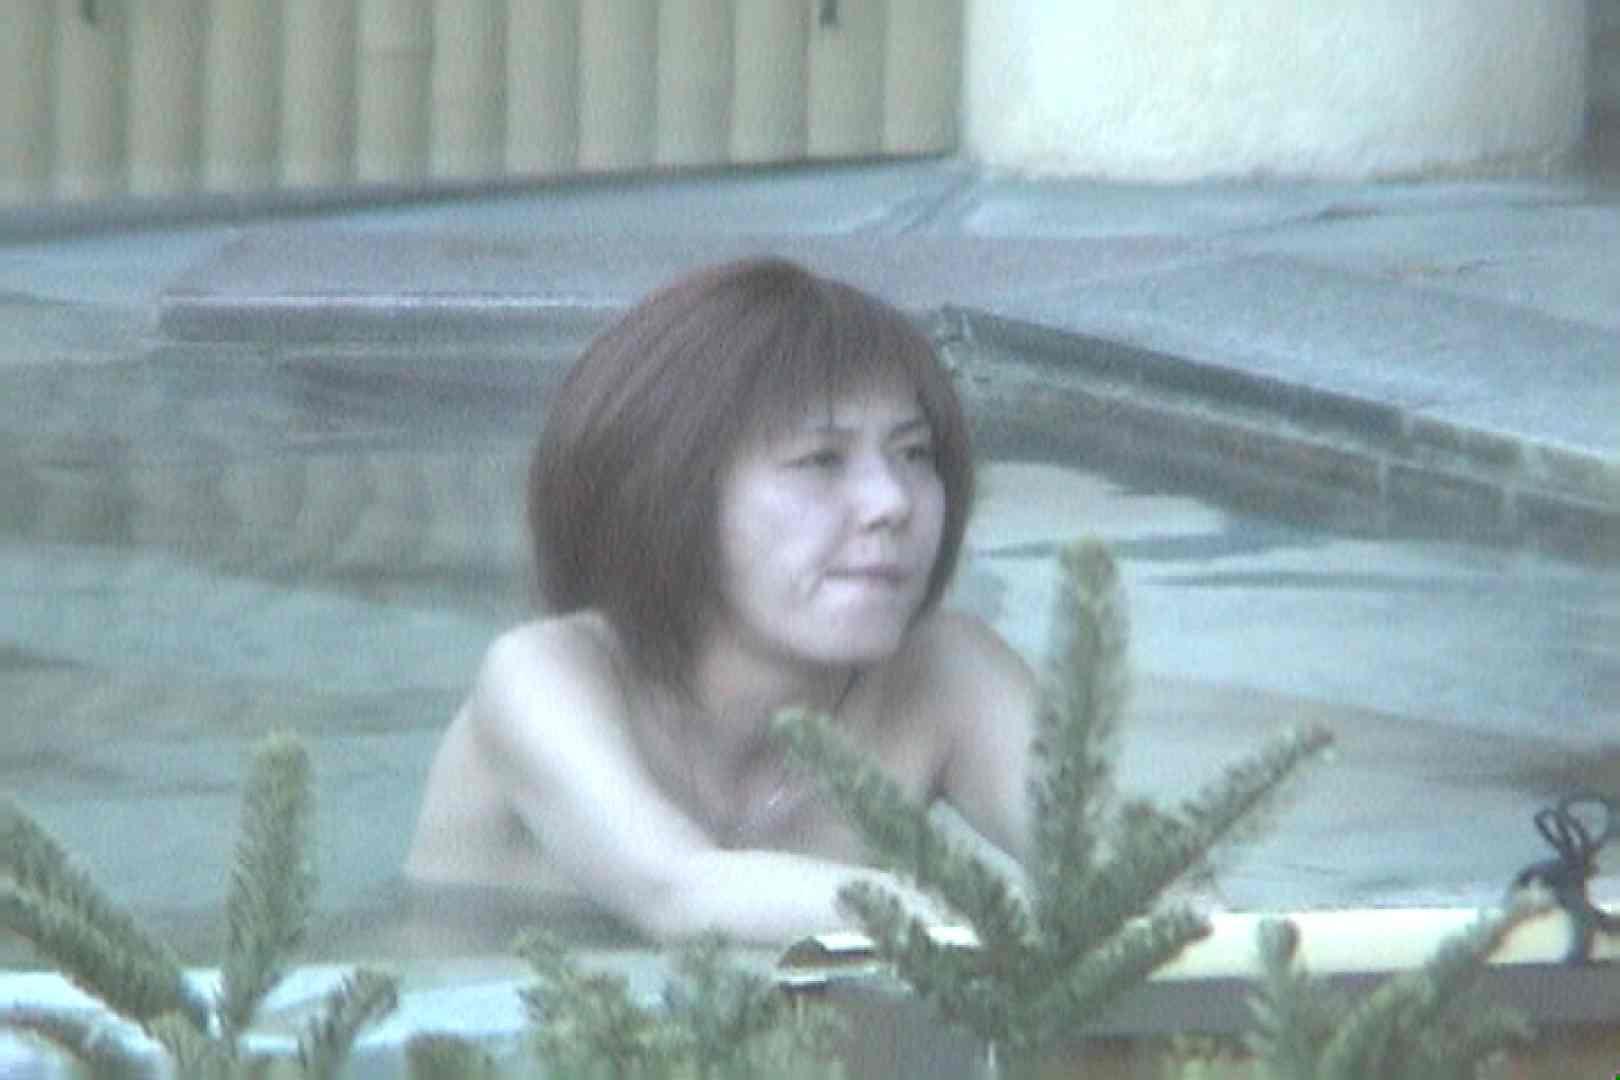 Aquaな露天風呂Vol.560 盗撮  46連発 24